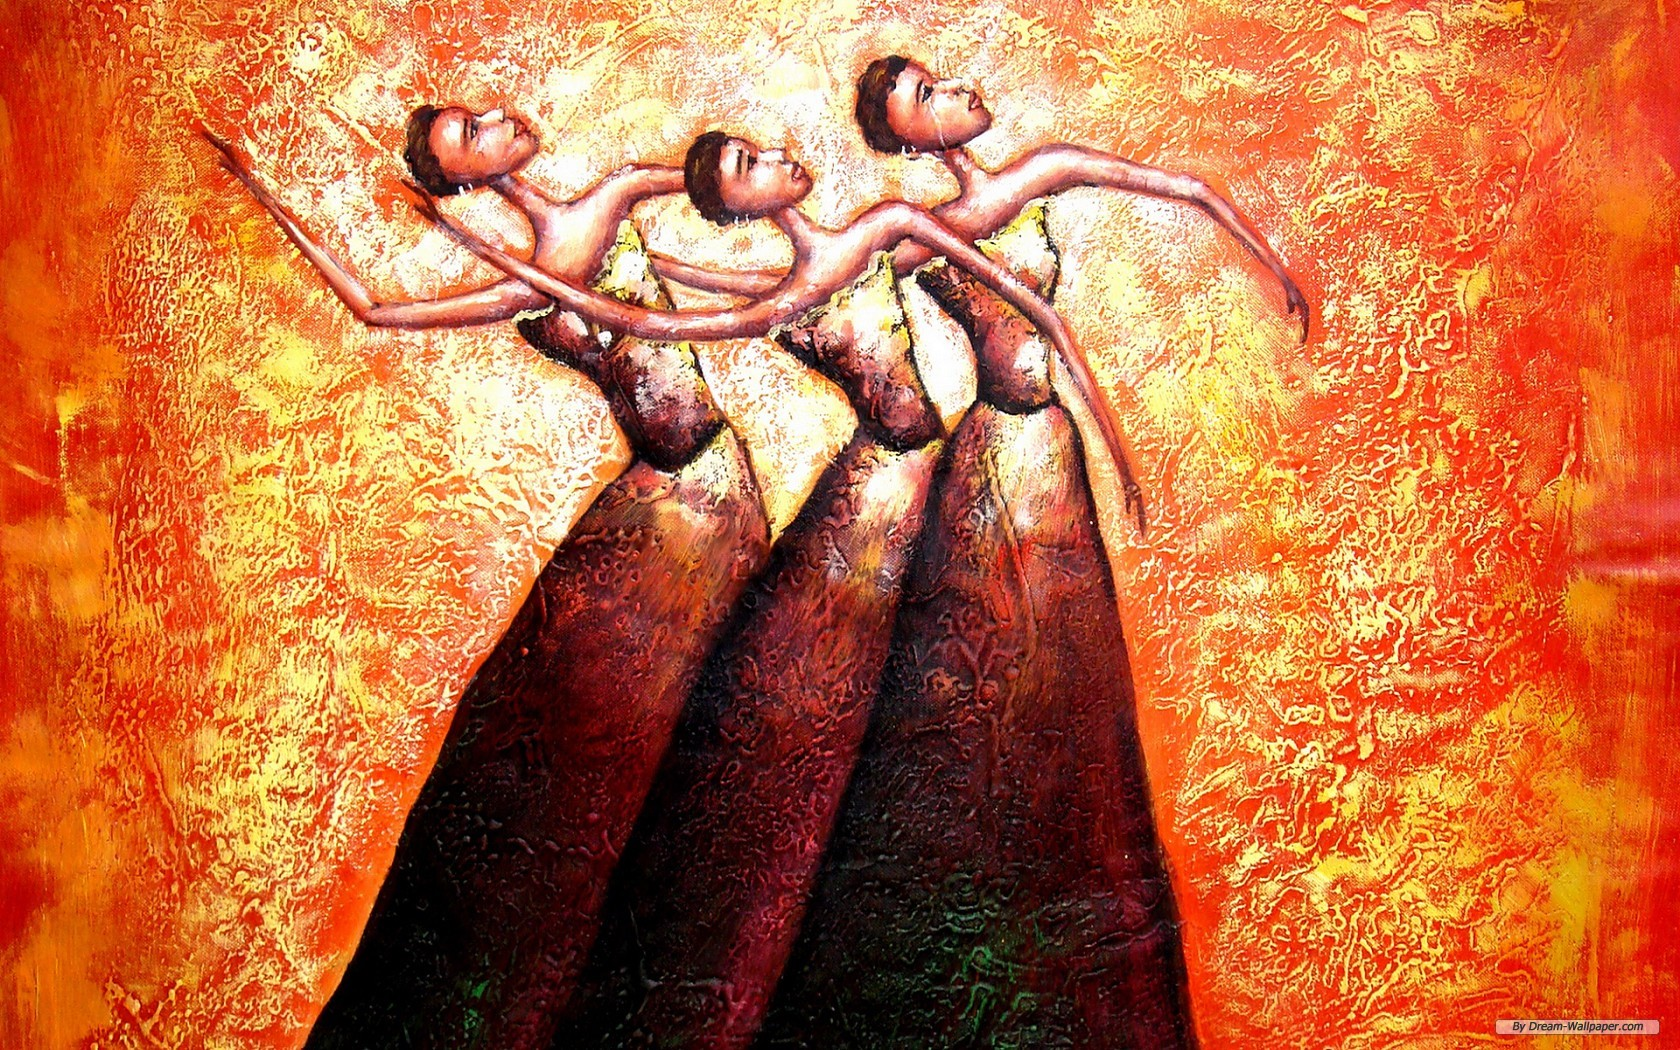 Free Art Wallpaper - Abstract Oil Painting Wallpaper Hd - HD Wallpaper